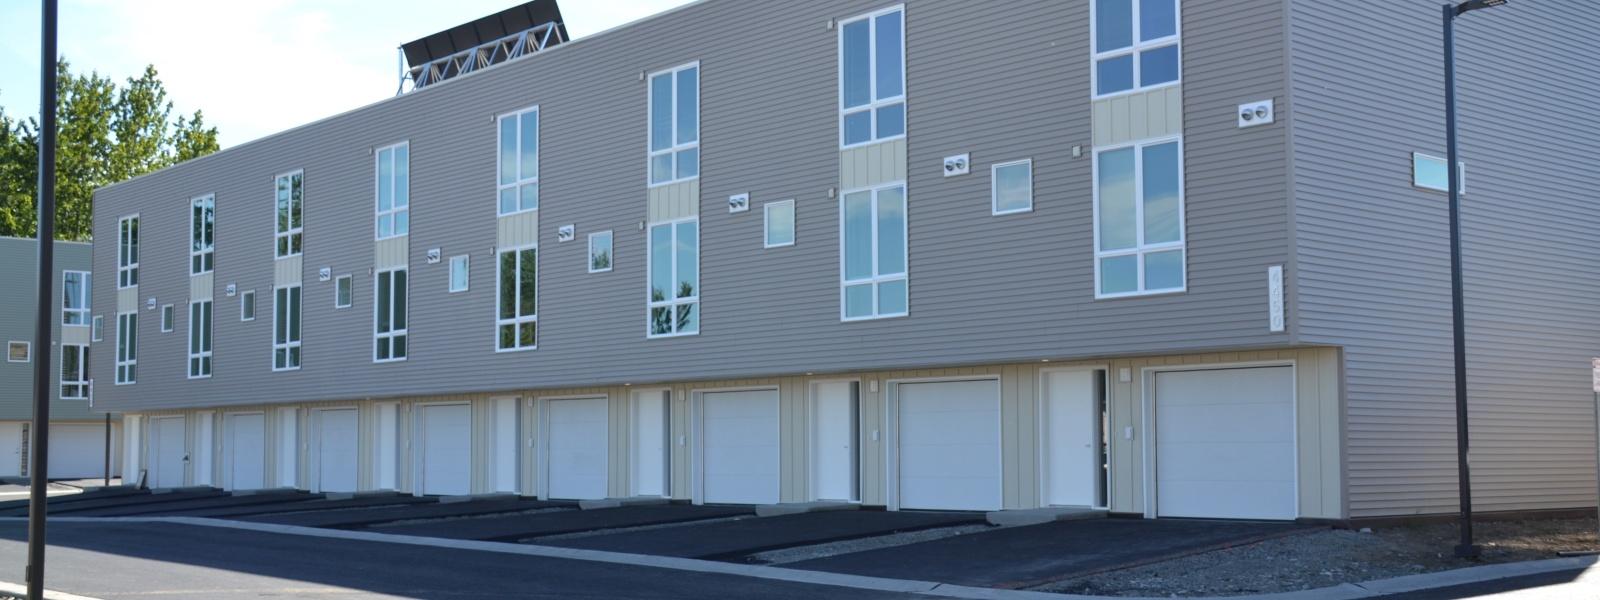 4450 San Roberto Ave, Anchorage, Alaska, 99504, 1 Bedroom Bedrooms, ,1 BathroomBathrooms,Townhome,For Rent,San Roberto Ave,1033